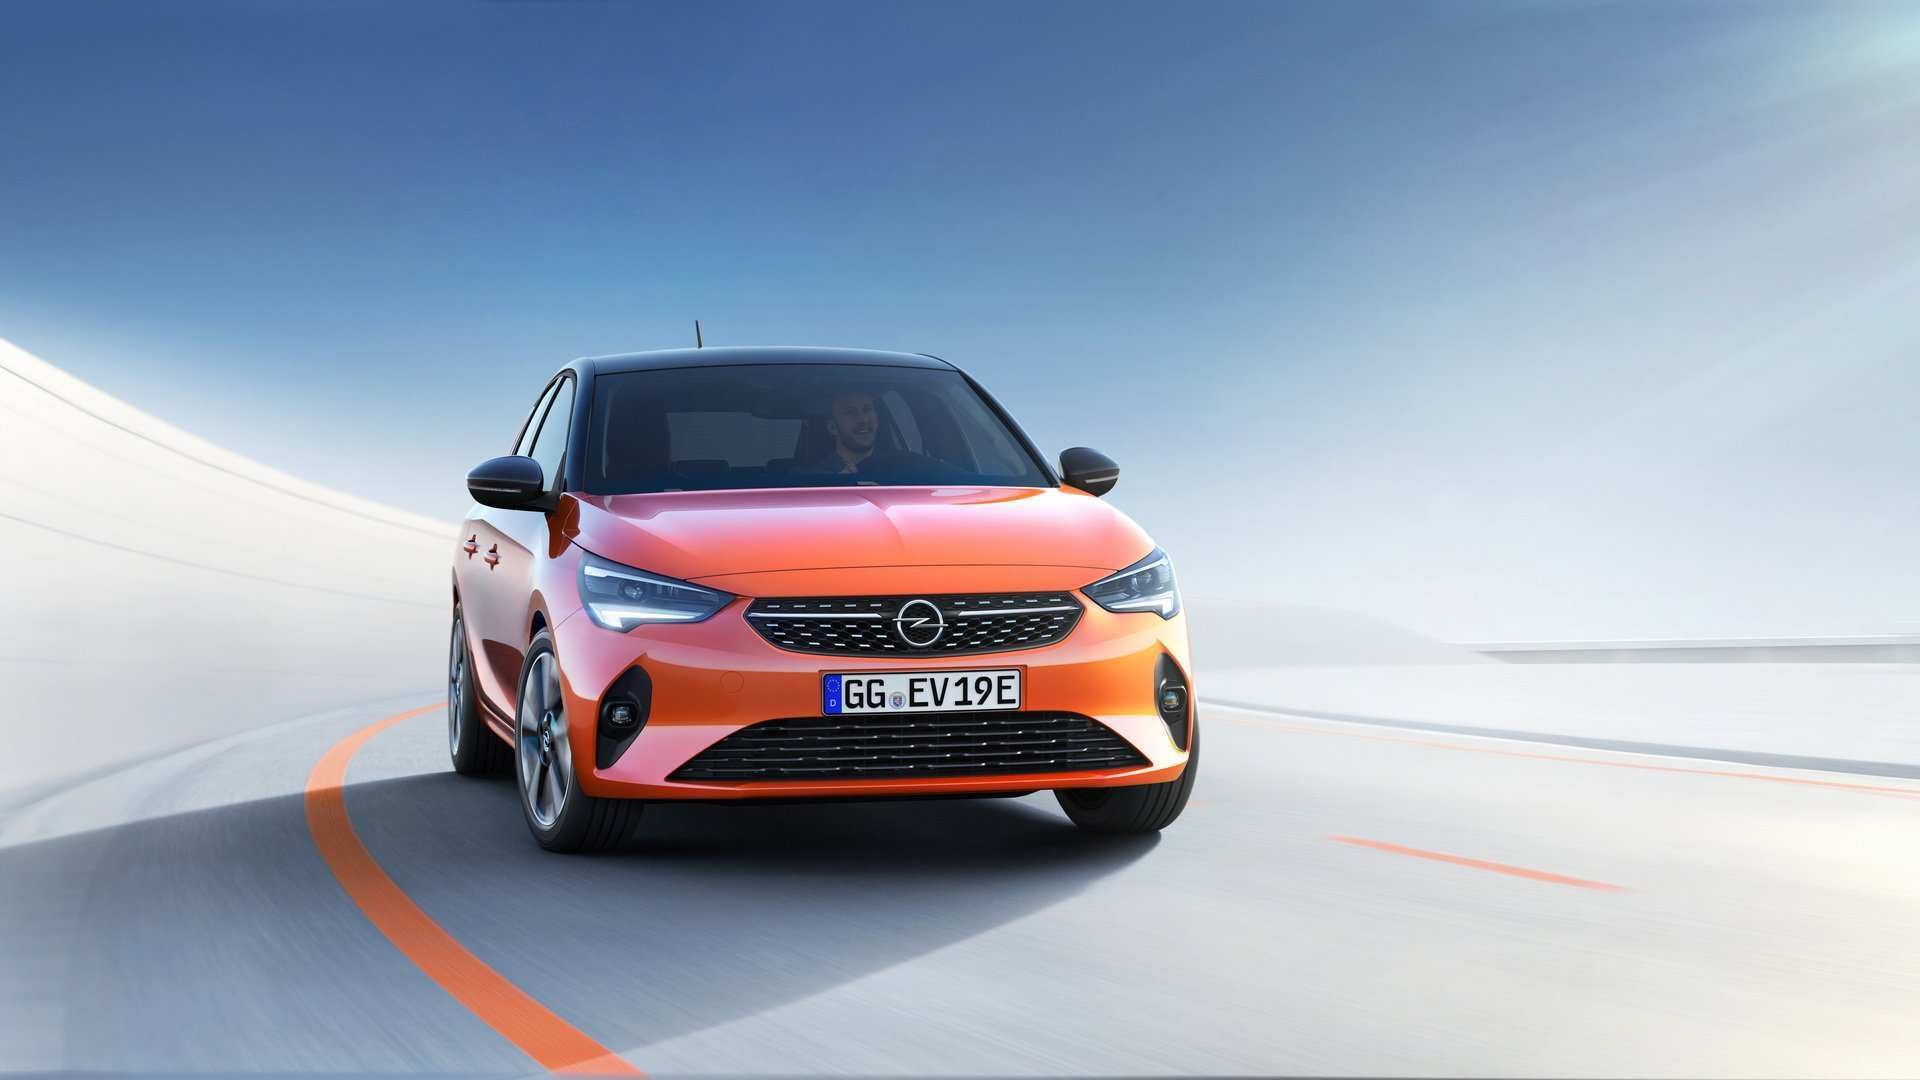 37 New Opel Ecorsa 2020 Price by Opel Ecorsa 2020